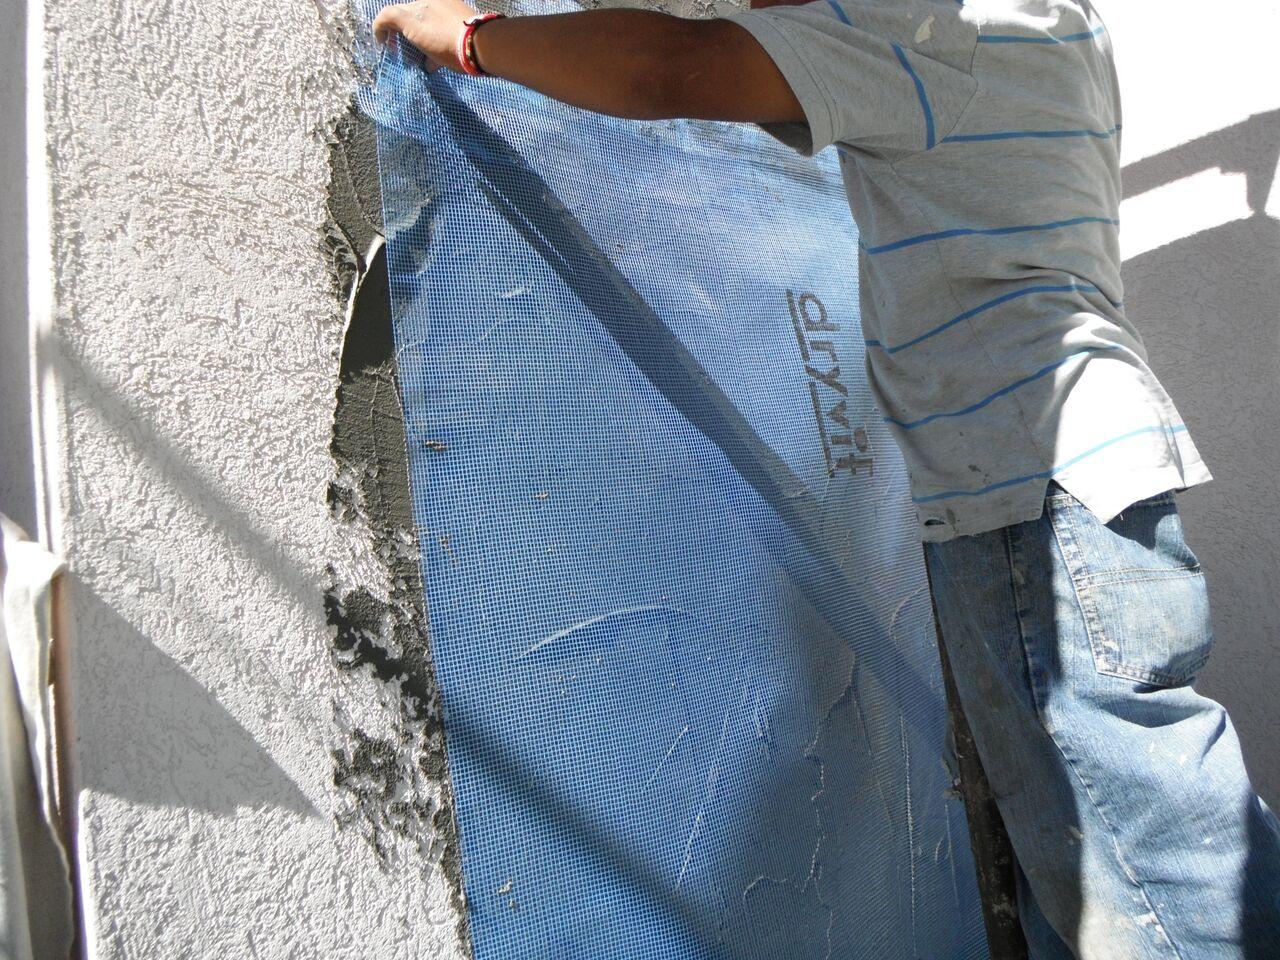 stucco-cracks-ram-3